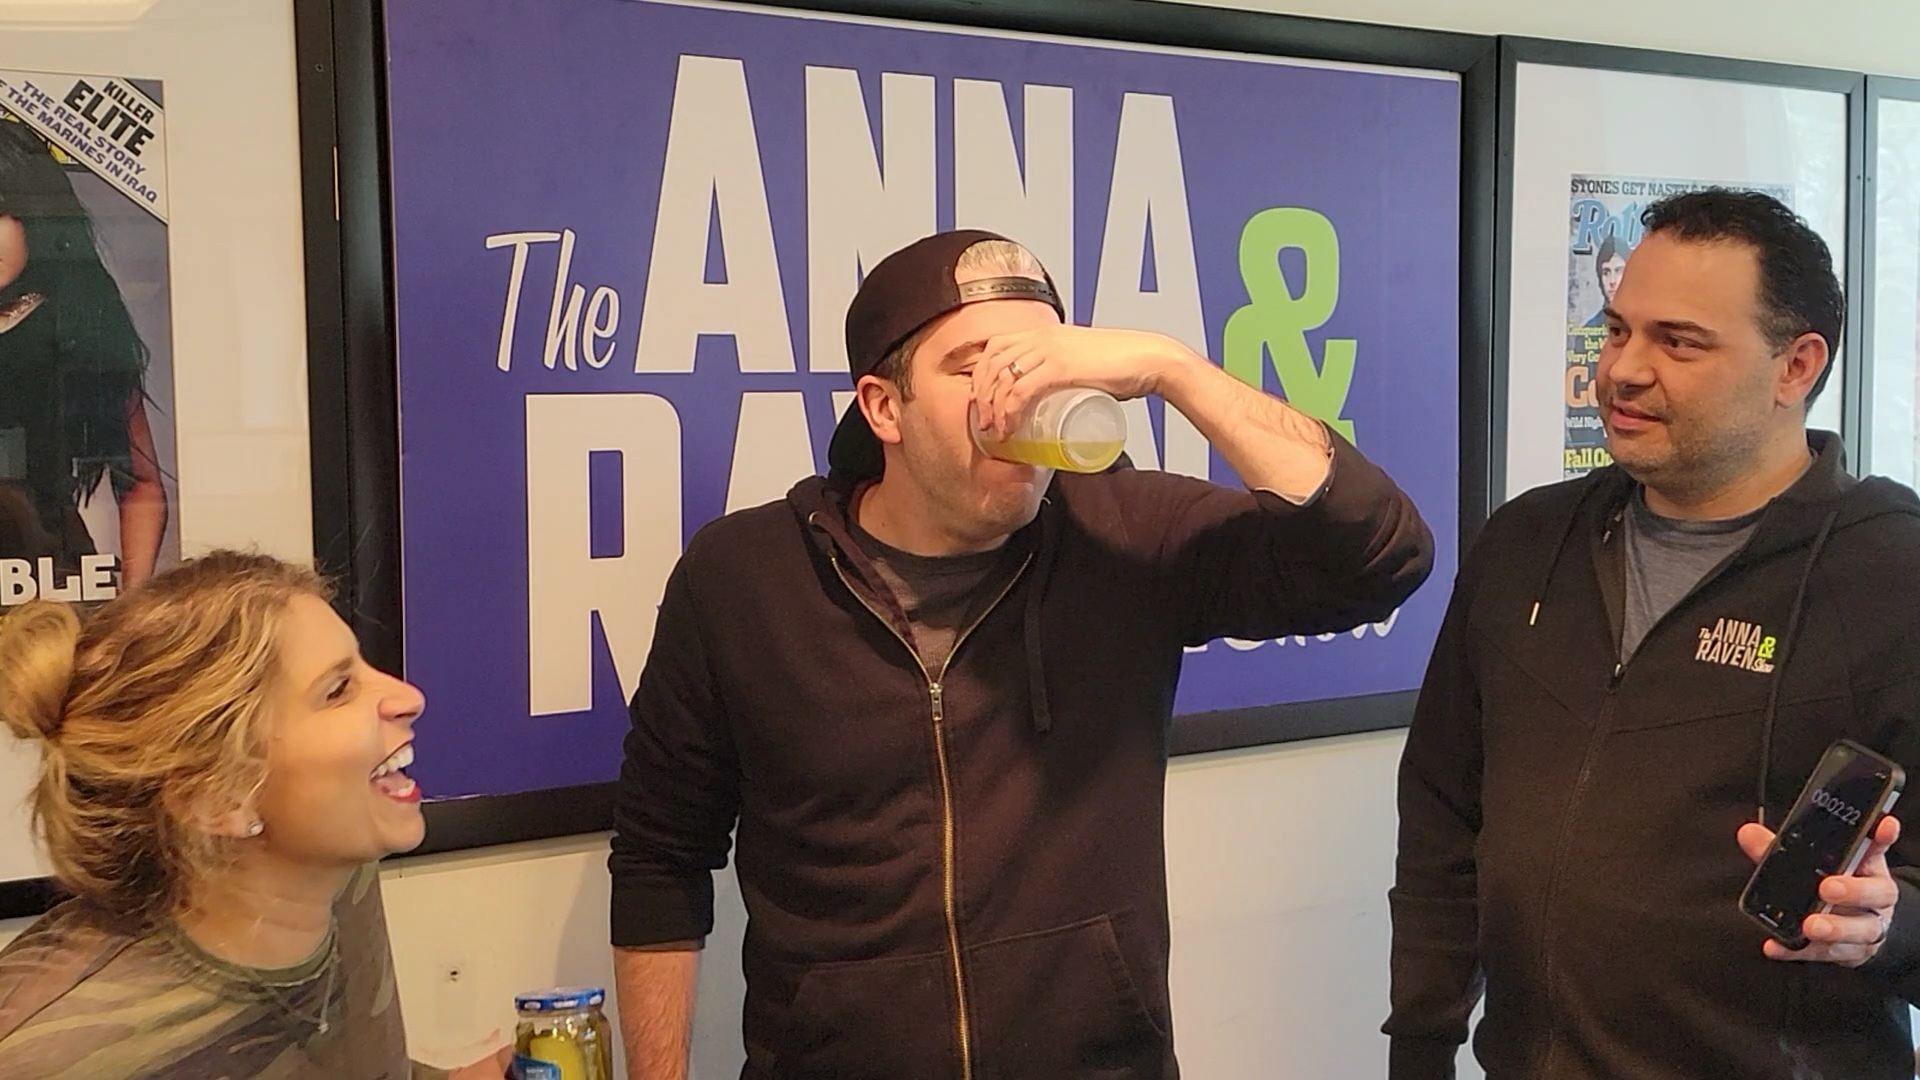 Producer Jon & The Pickle Juice Chug